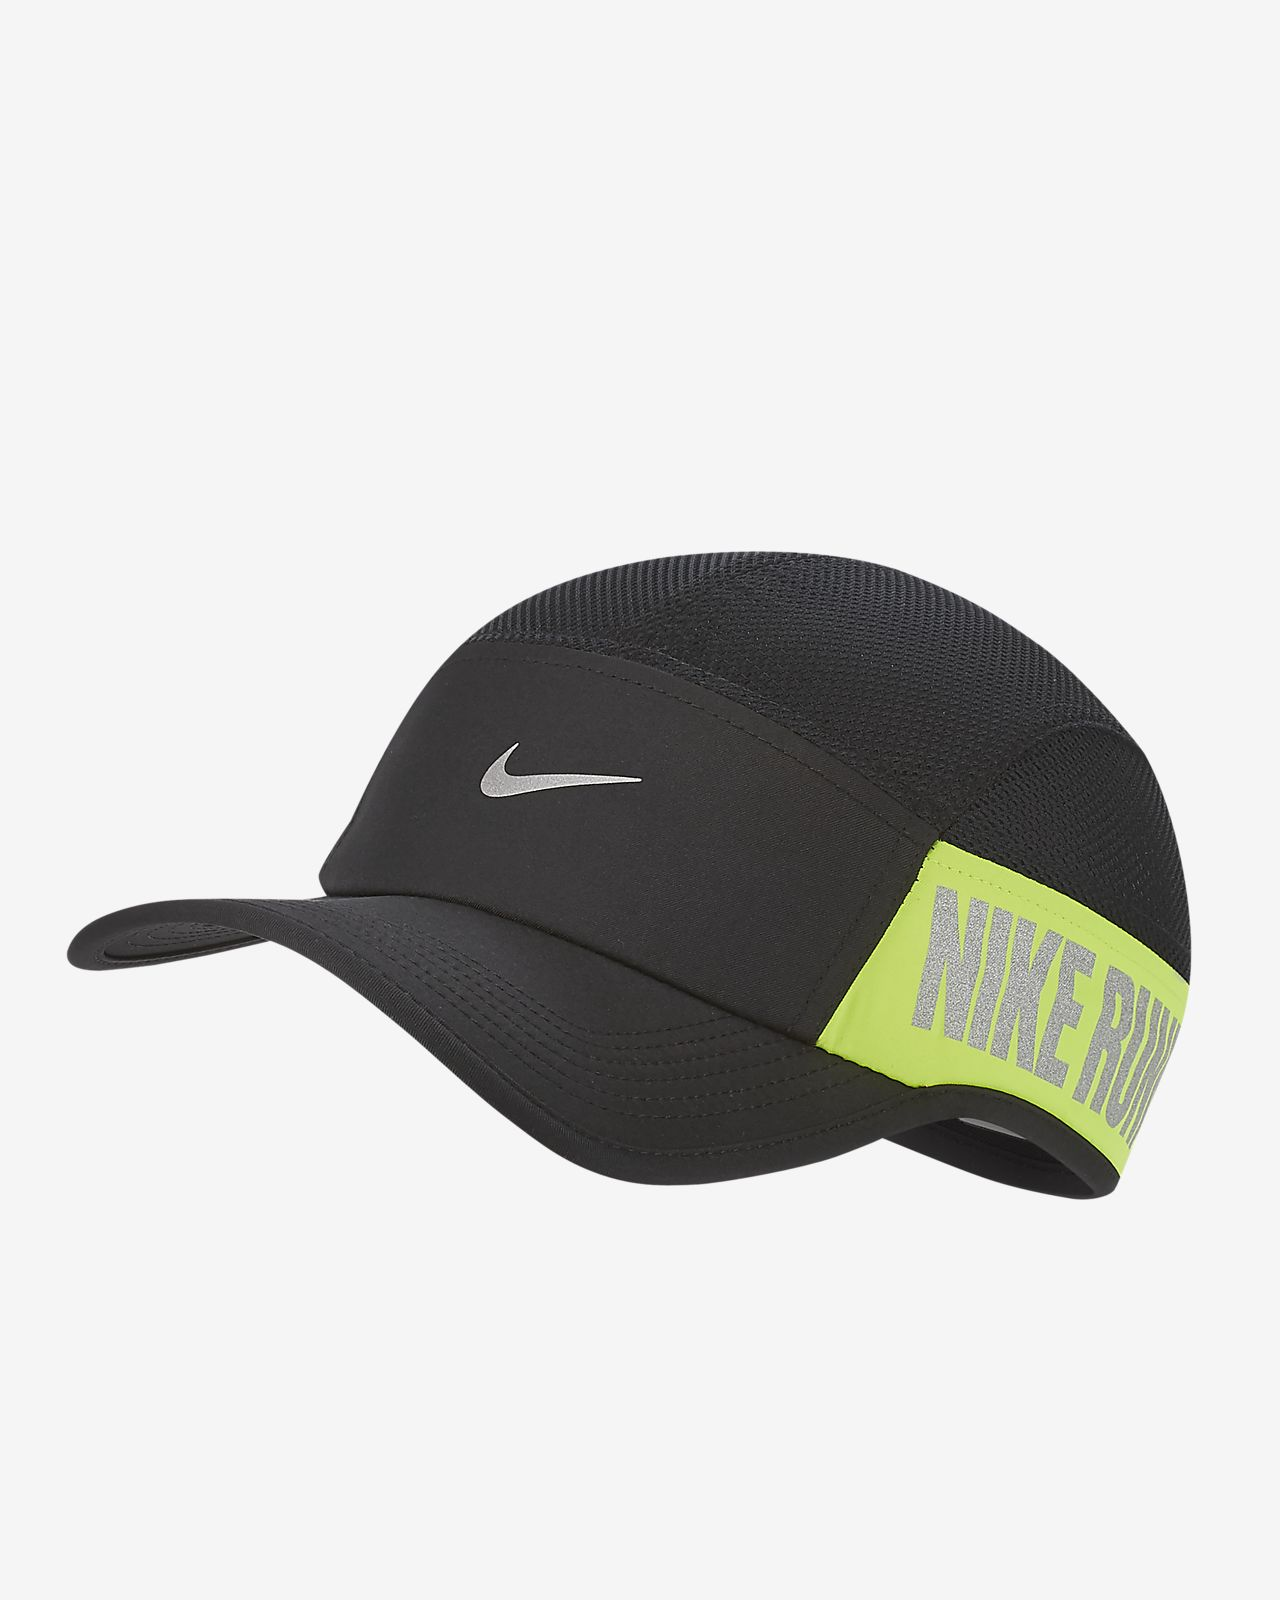 39c5a3b7fdb3f Low Resolution Nike AW84 Running Hat Nike AW84 Running Hat